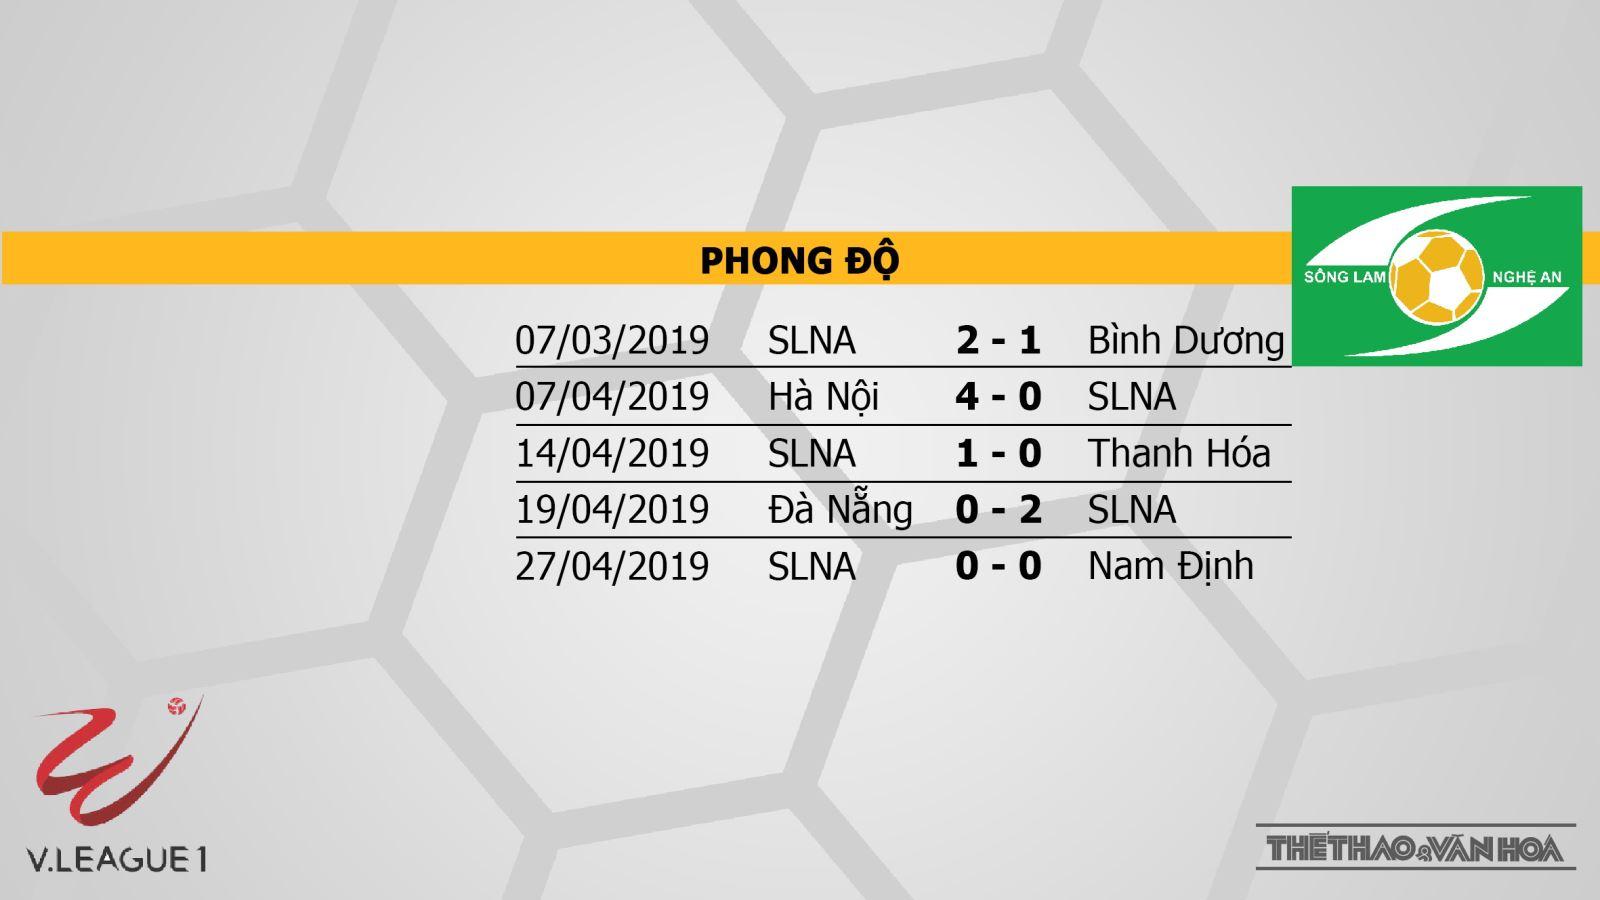 VTV6, Viettel vs SLNA, Viettel, SLNA, truc tiep bong da, trực tiếp bóng đá, truc tiep Viettel, truc tiep Viettel vs SLNA, v league 2019, truc tiep v league, BDTV